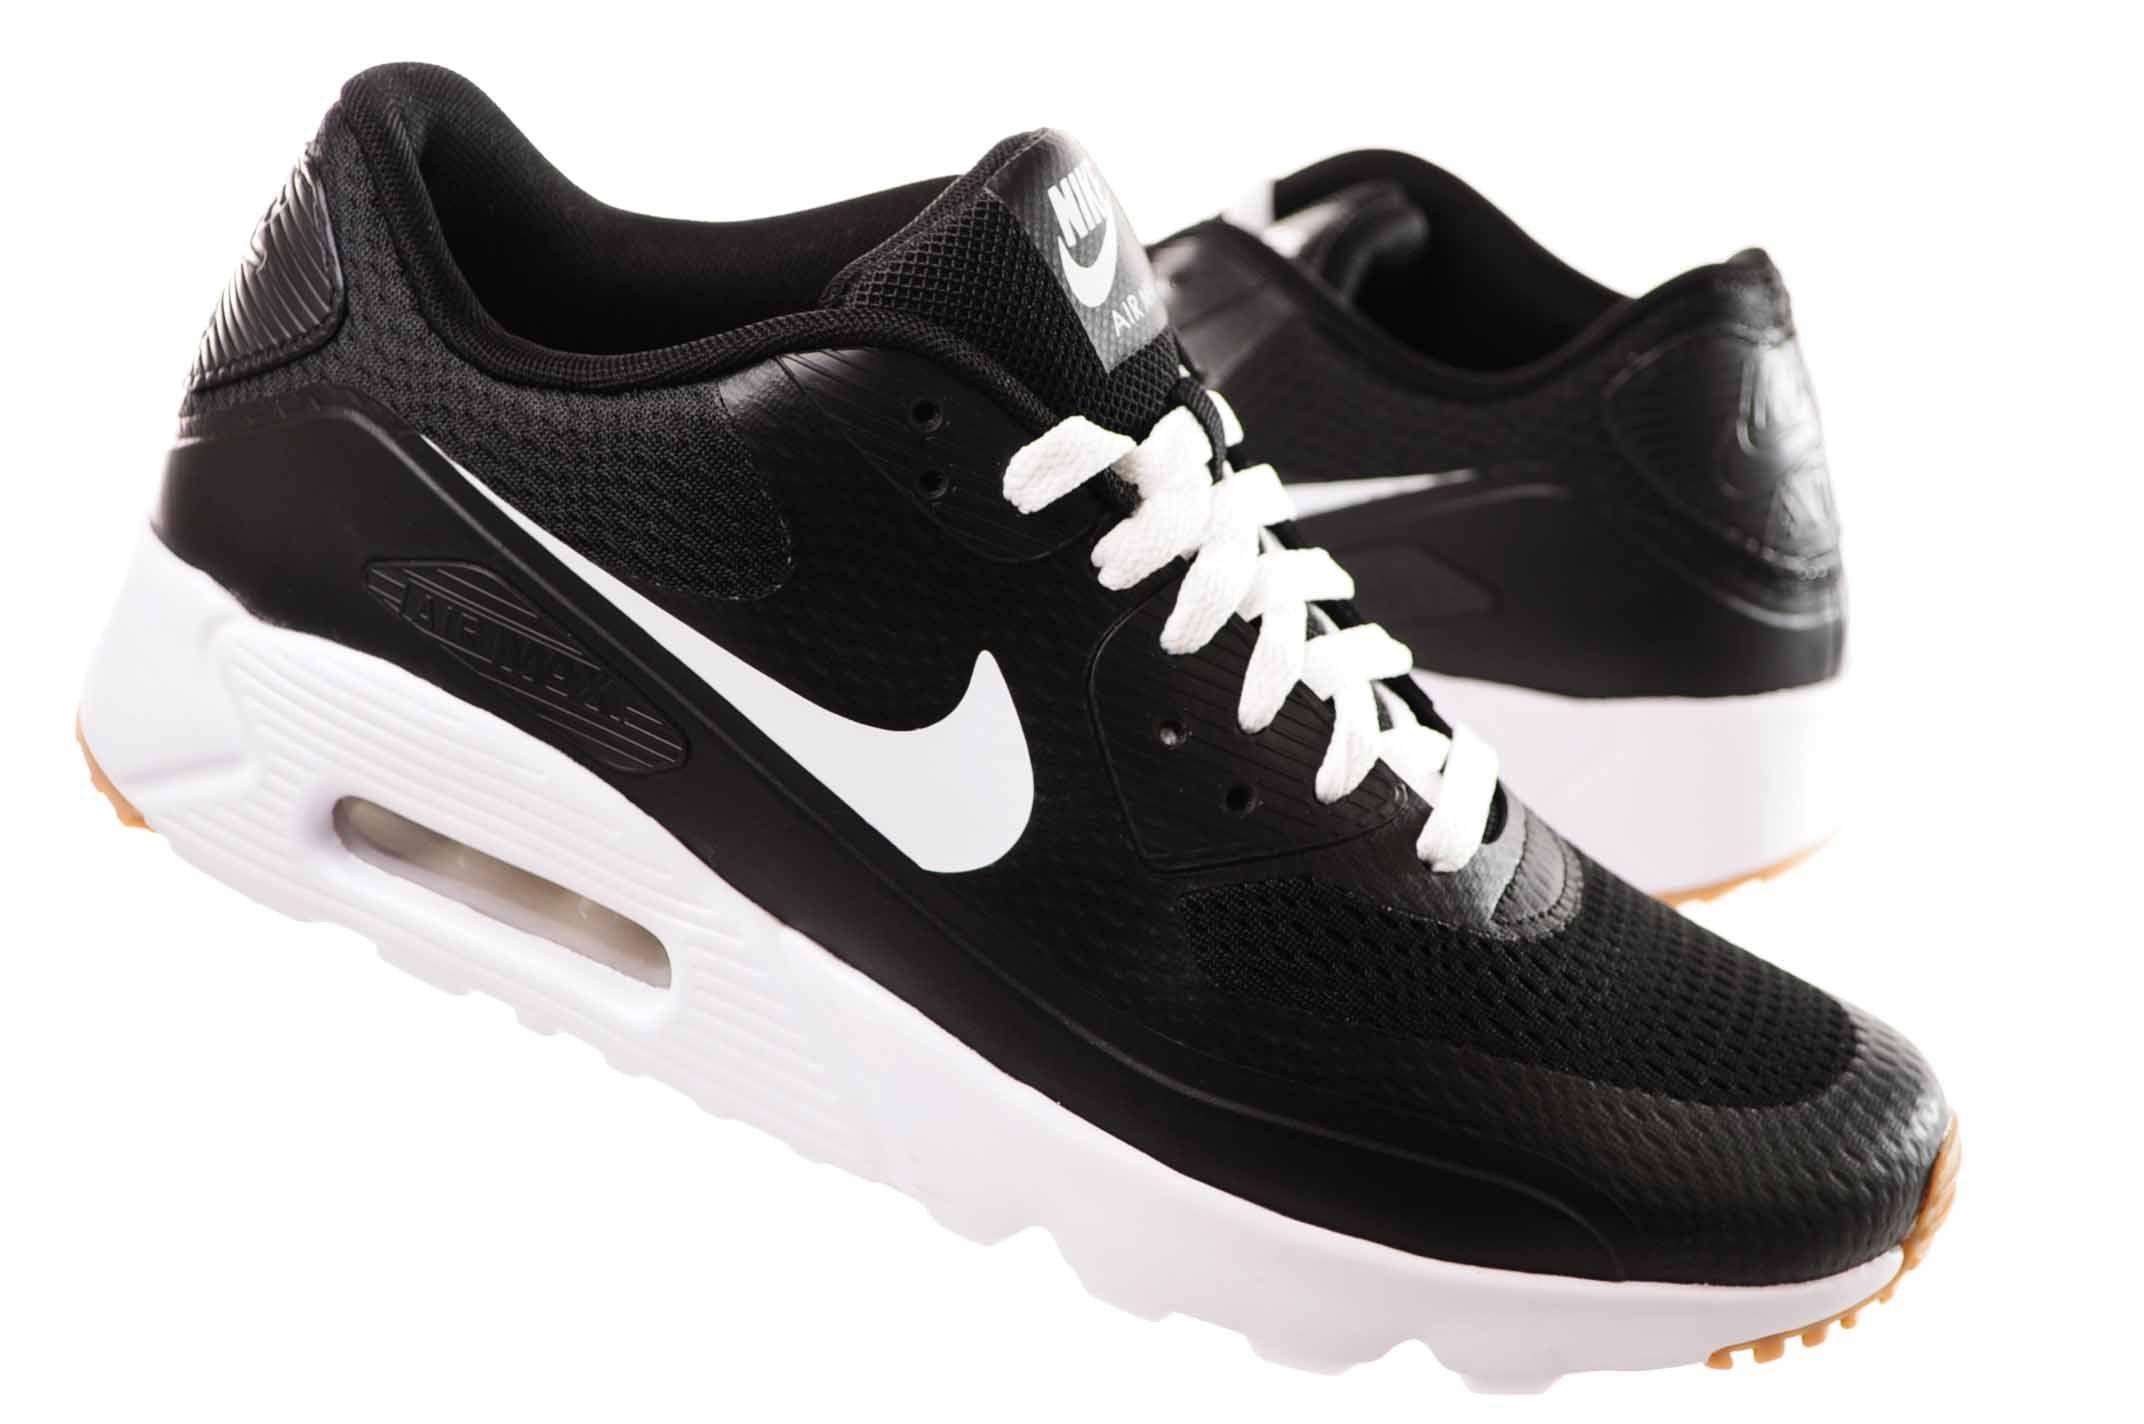 Nike Air Max 90 Ultra Essential Buty Męskie 42 6899275370